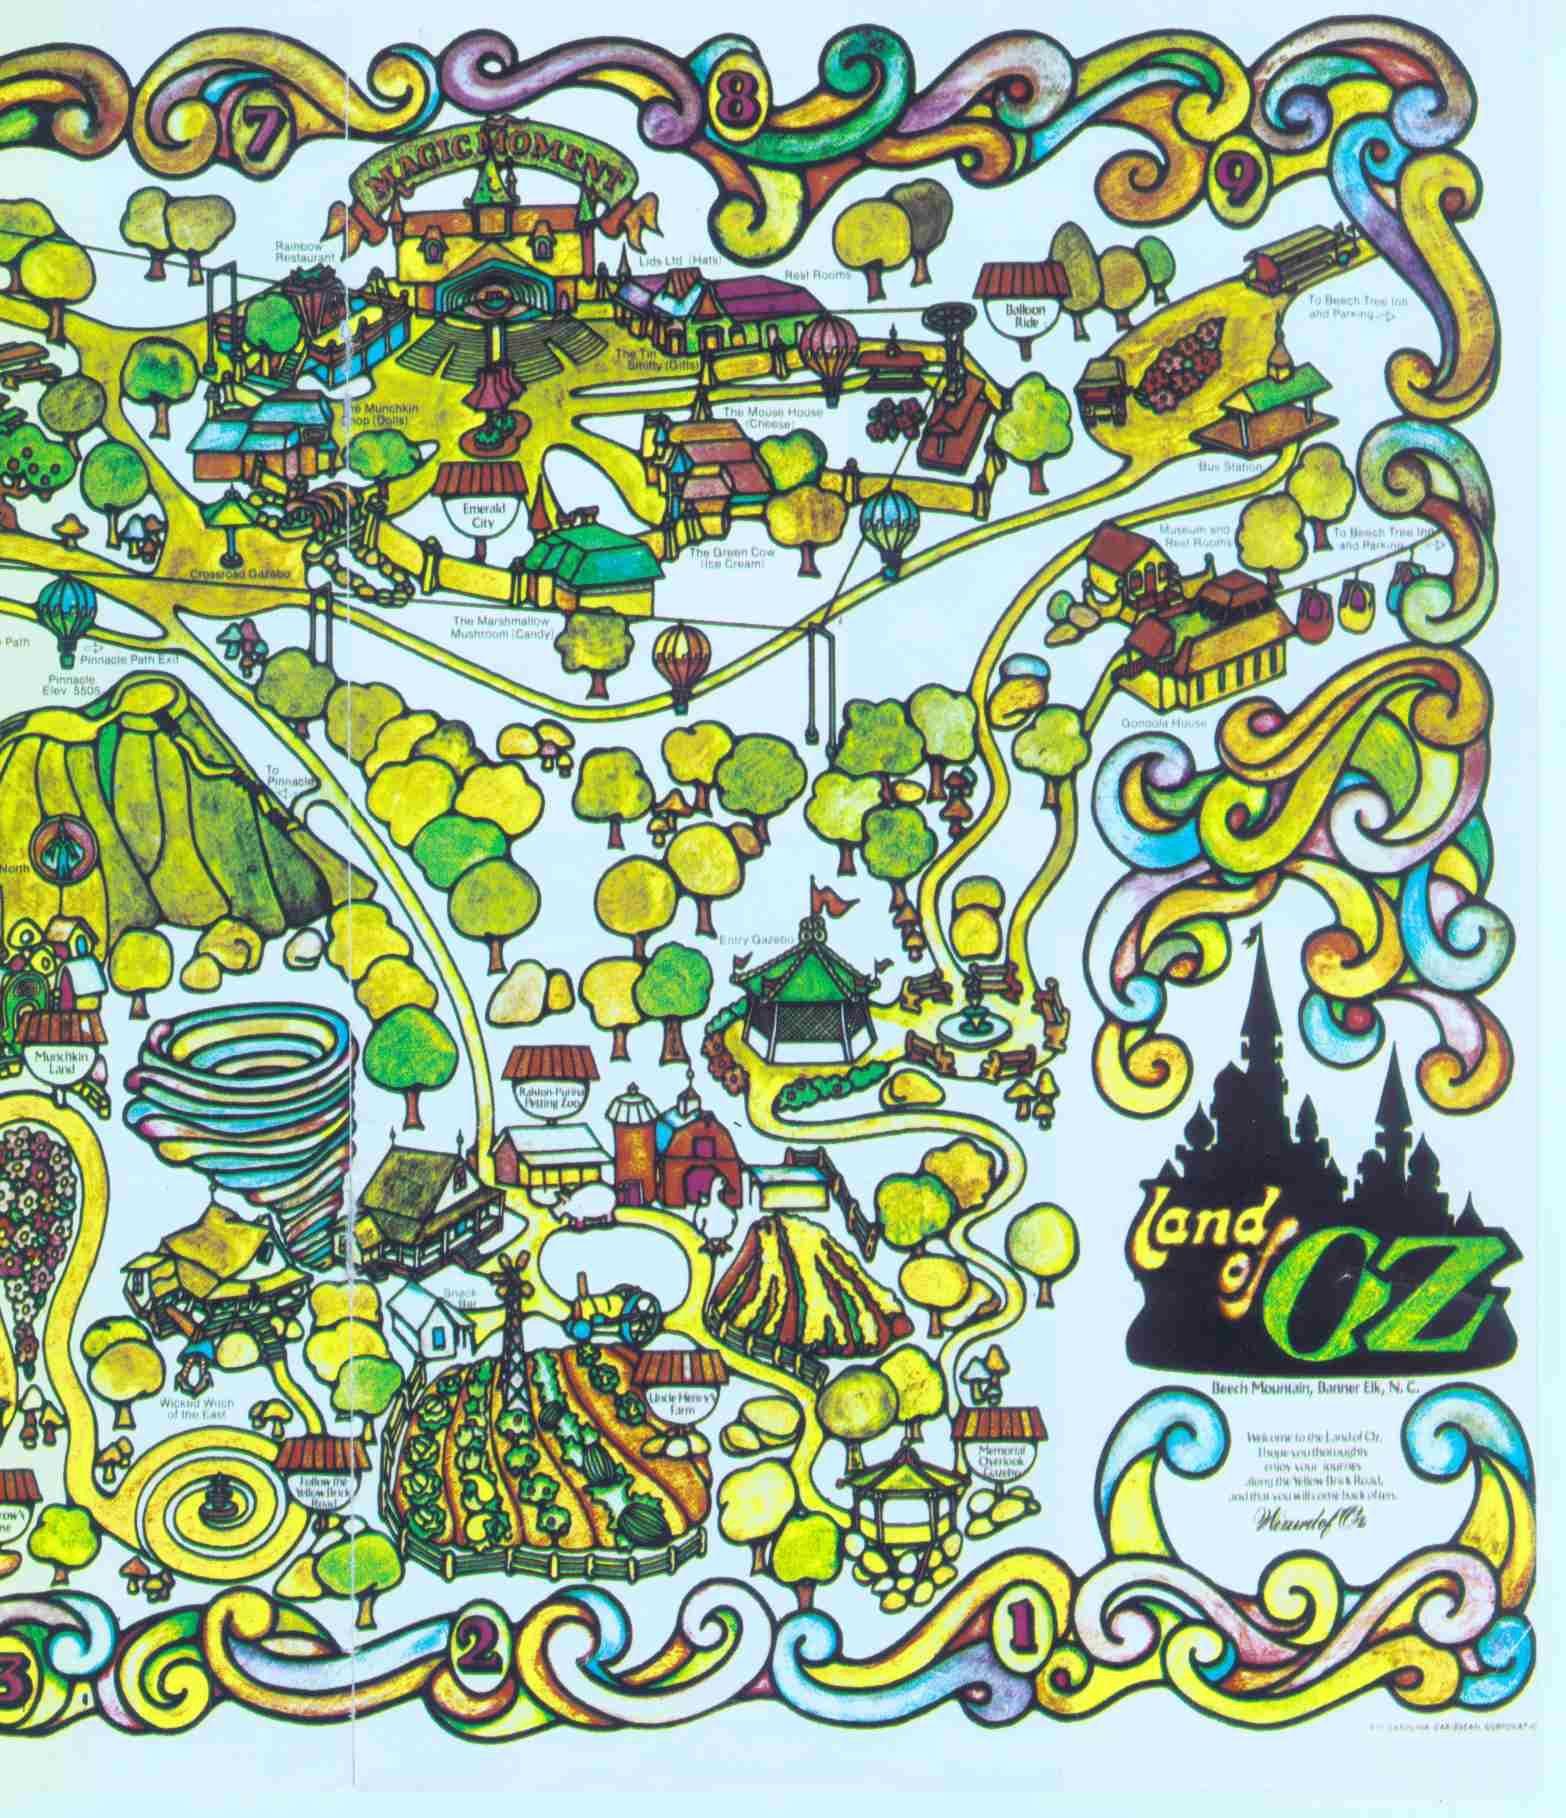 Beech Mtn Land Of Oz Map - 60s, 70s?